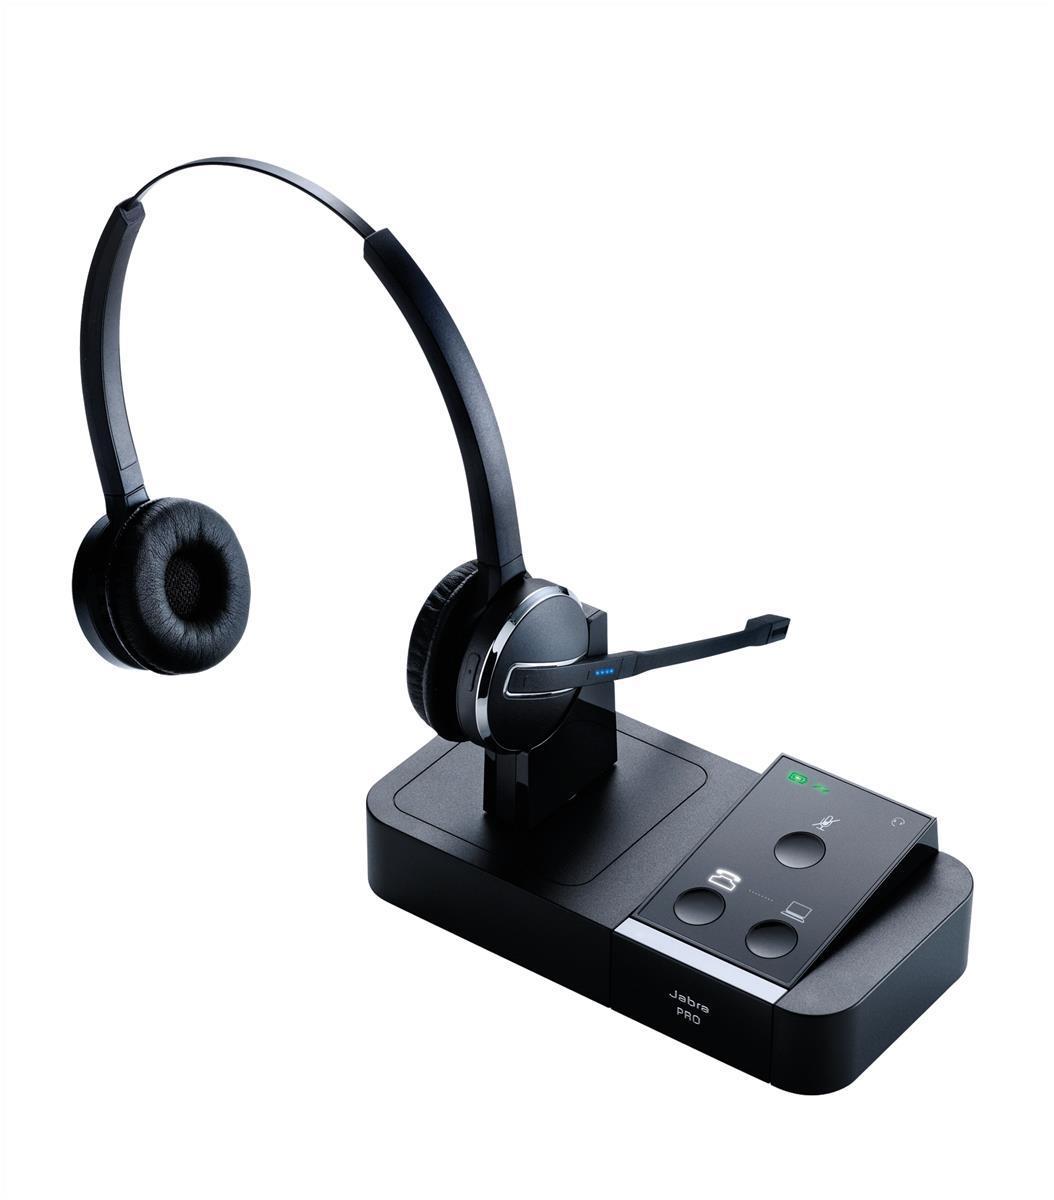 Jabra PRO 9450 Duo Headset